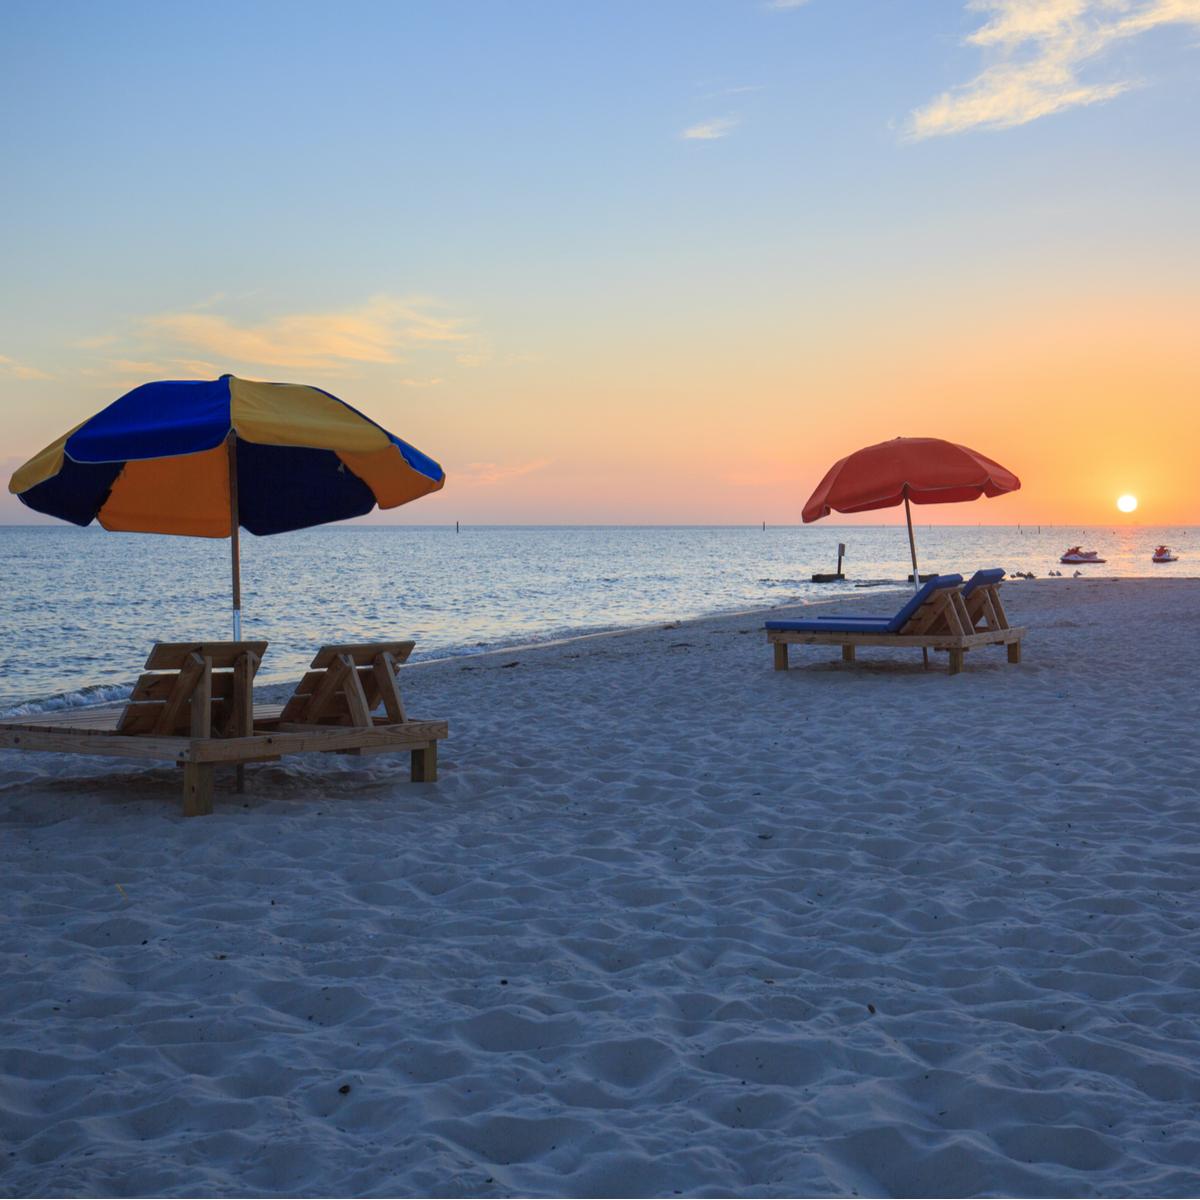 Sunset in Biloxi beach, Mississippi, along Gulf Coast shore.